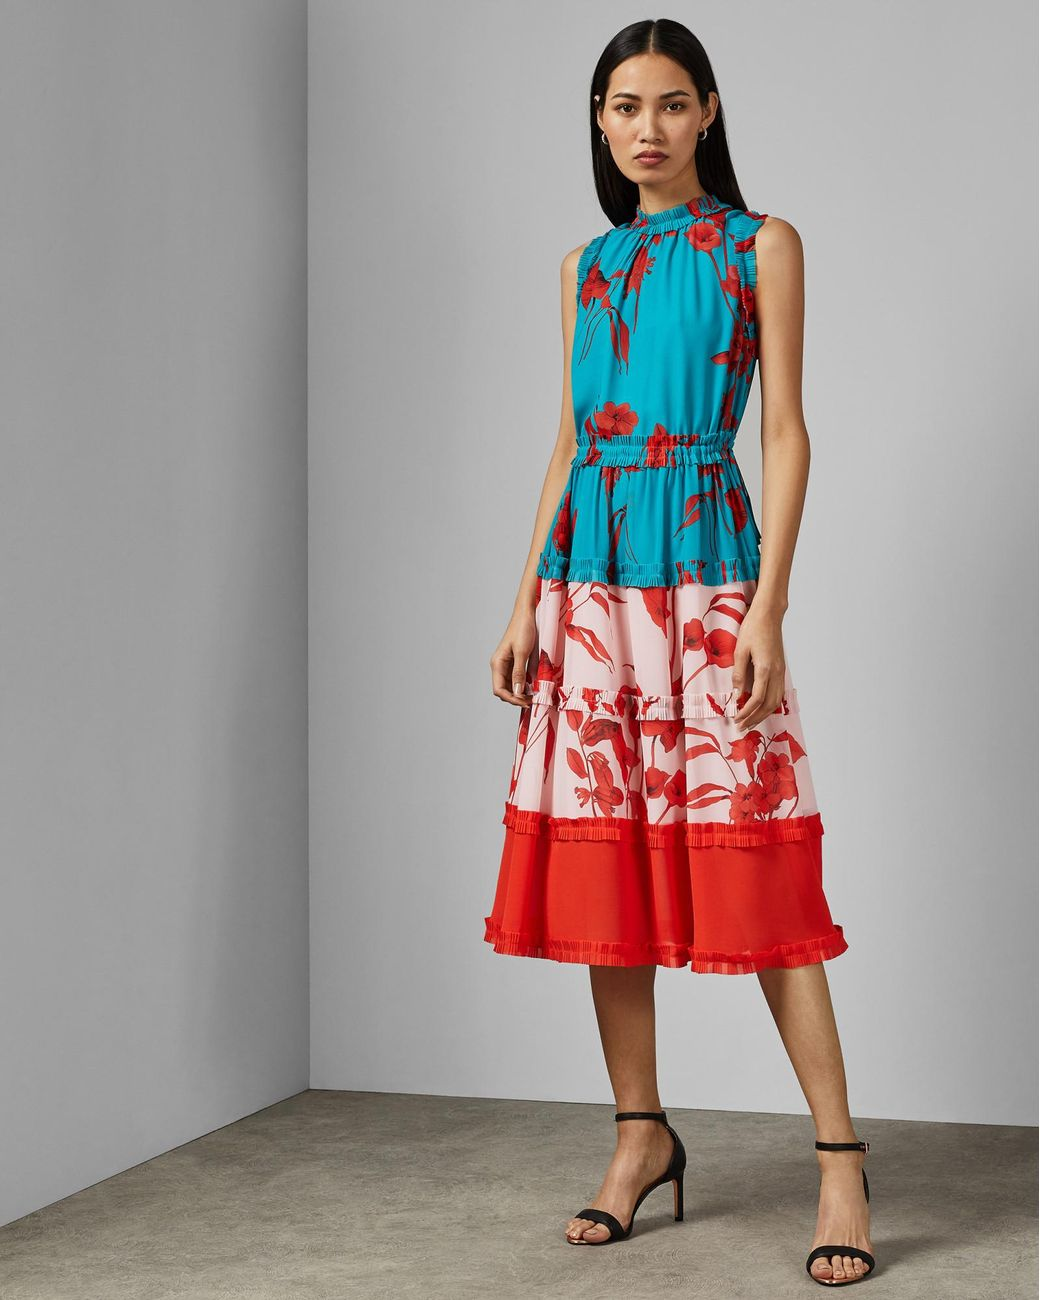 875e97d48d Ted Baker Fantasia Tiered Midi Dress - Lyst